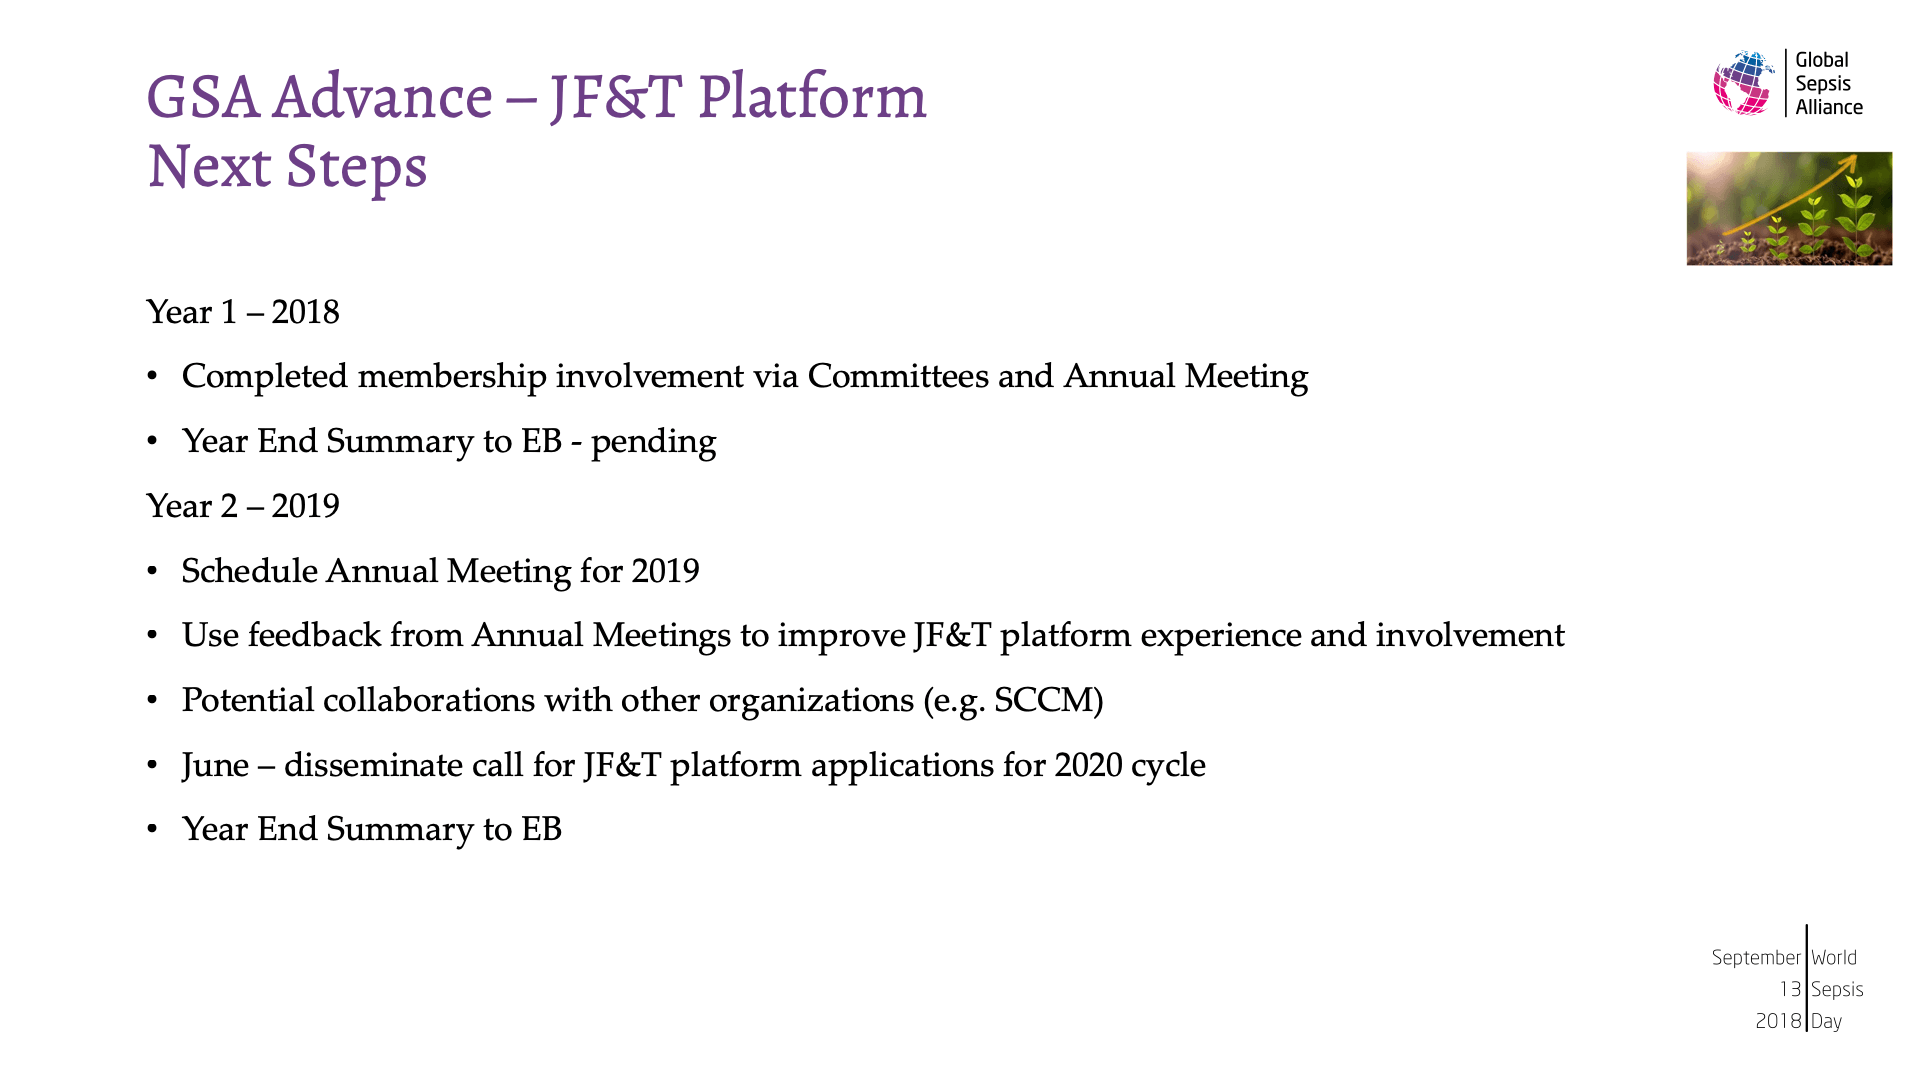 GSA Advance ESICM 2018 20.png